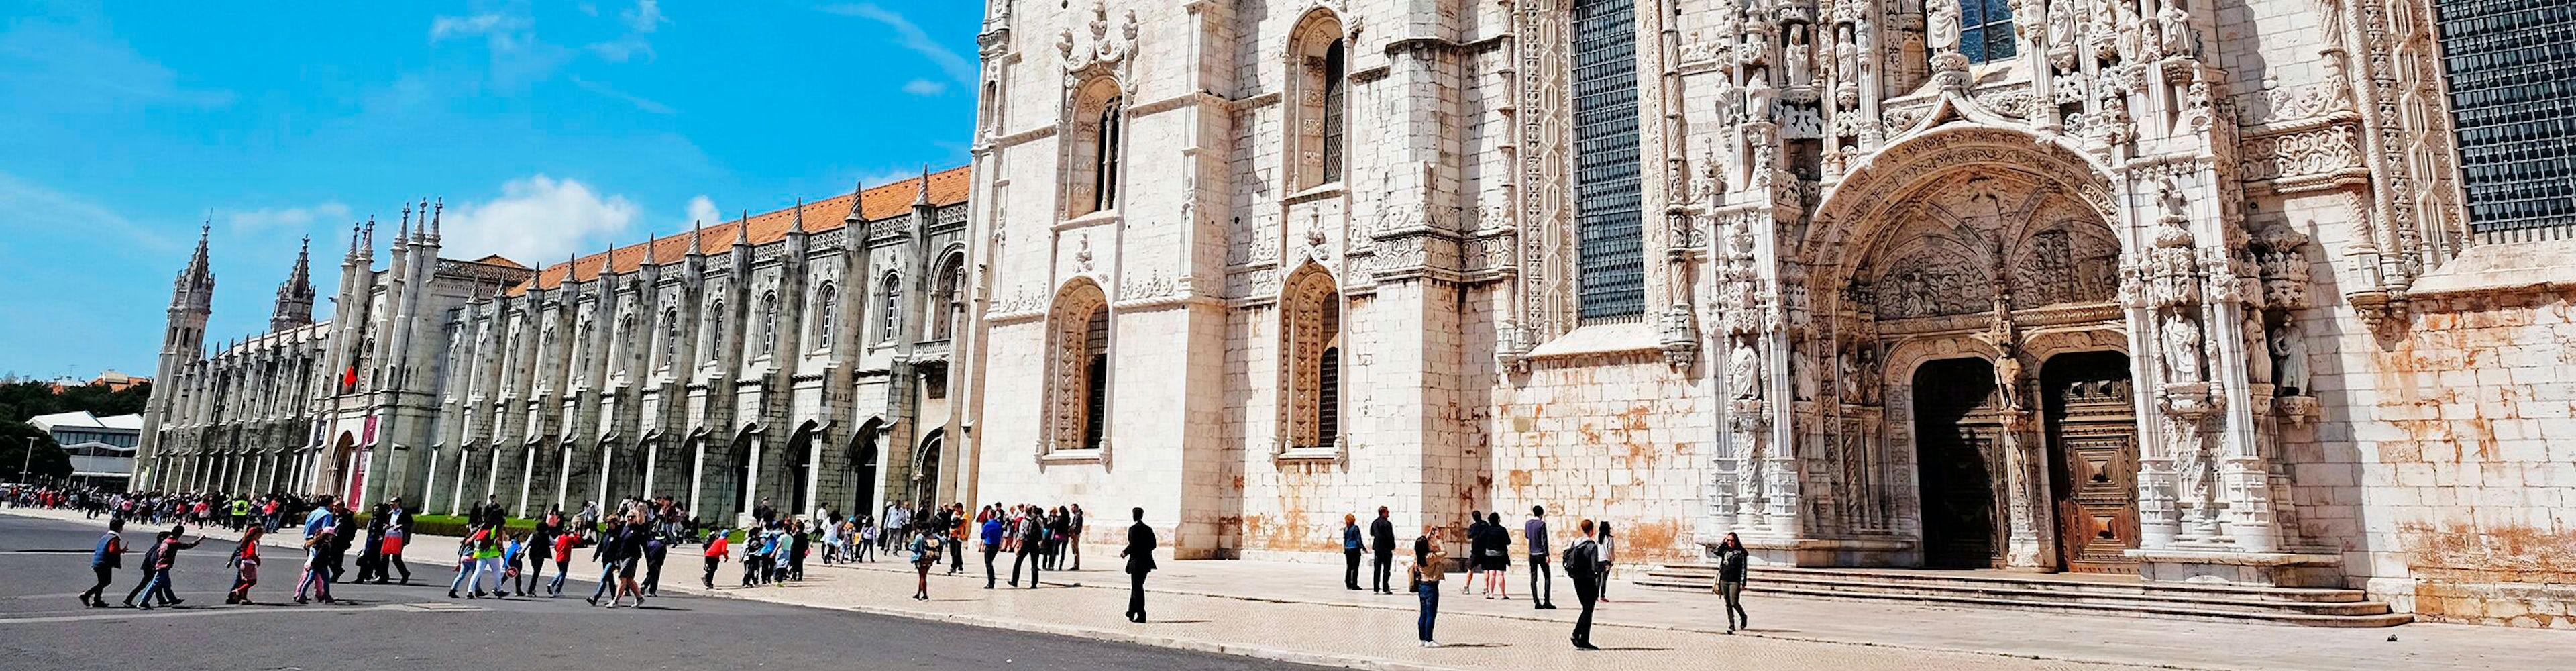 Excursión de día completo - Lisboa Total